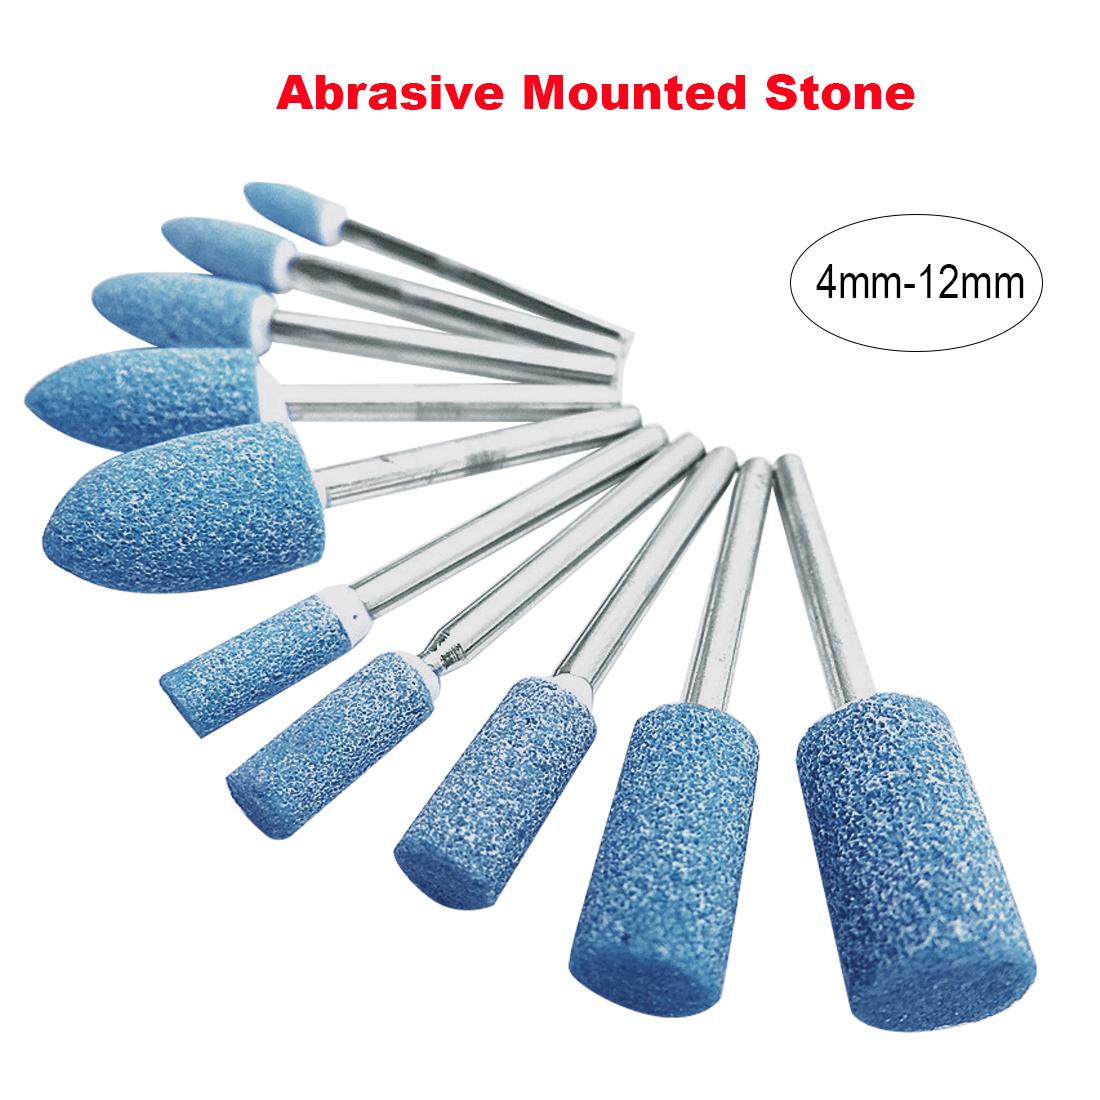 50//100x 1//8/'/' Shank Abrasive Mounted Stone Rotary Tool Grinding Wheel For Dremel